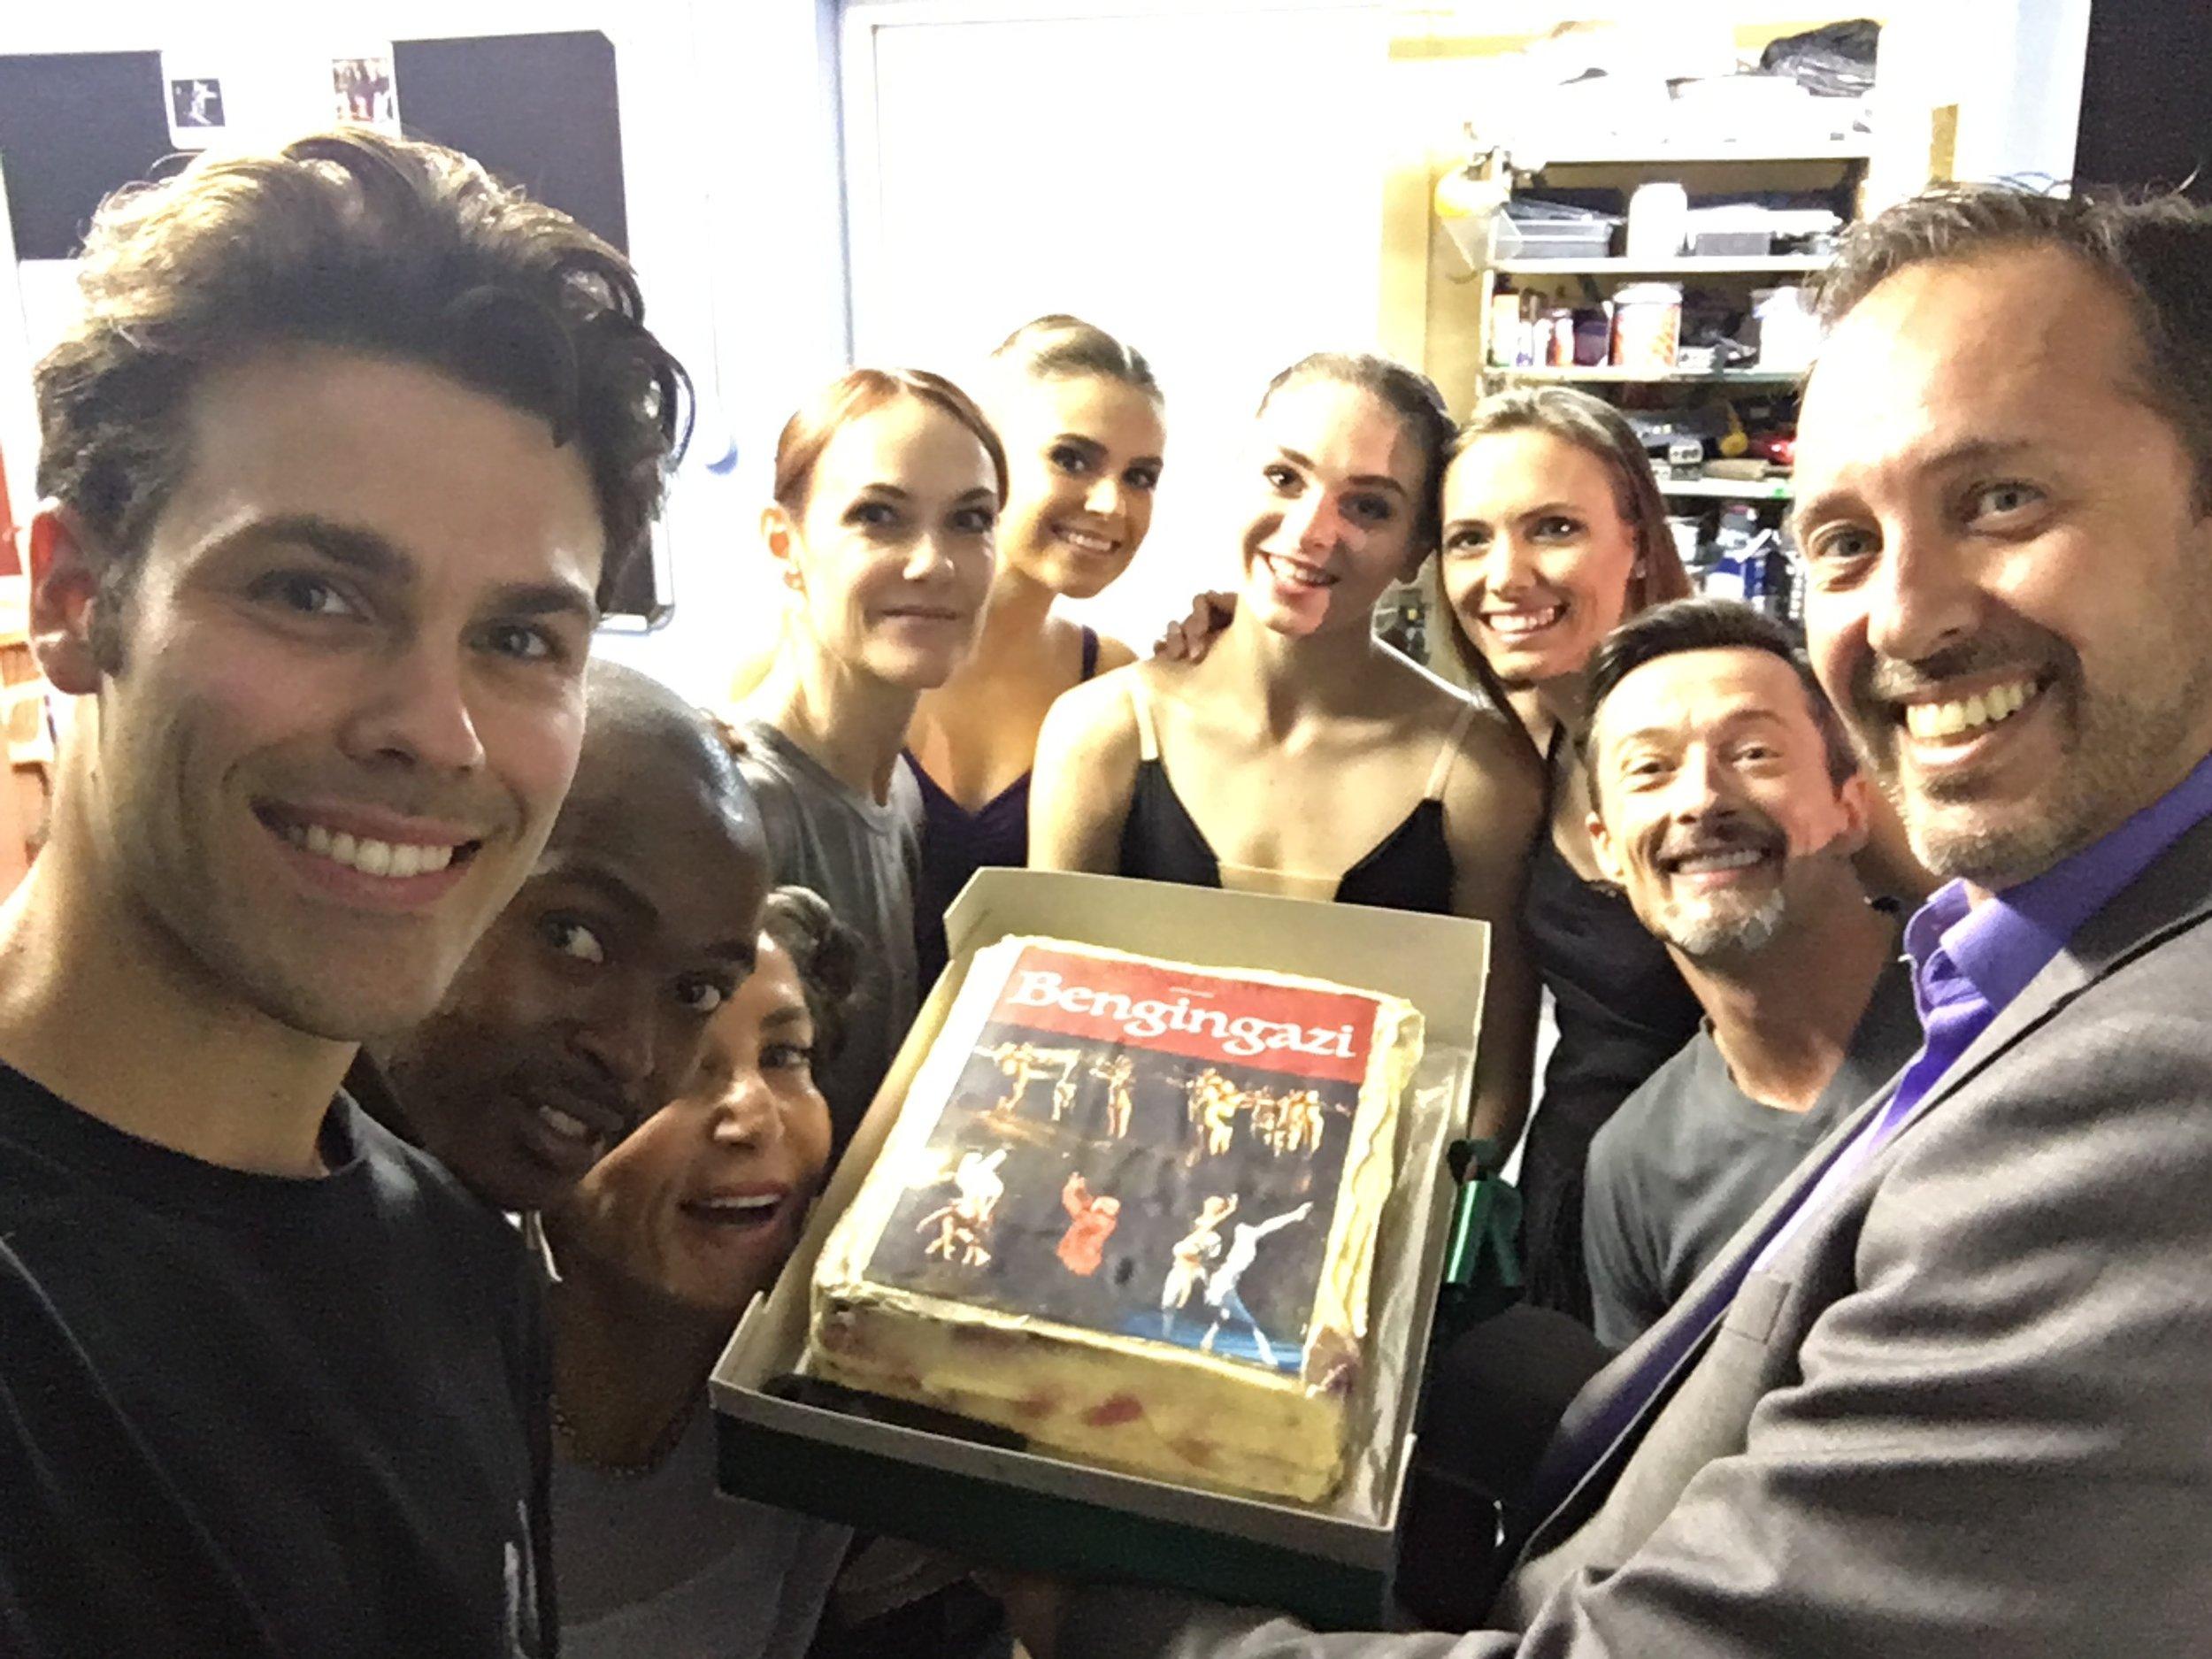 - Beautiful Cast and Cake!